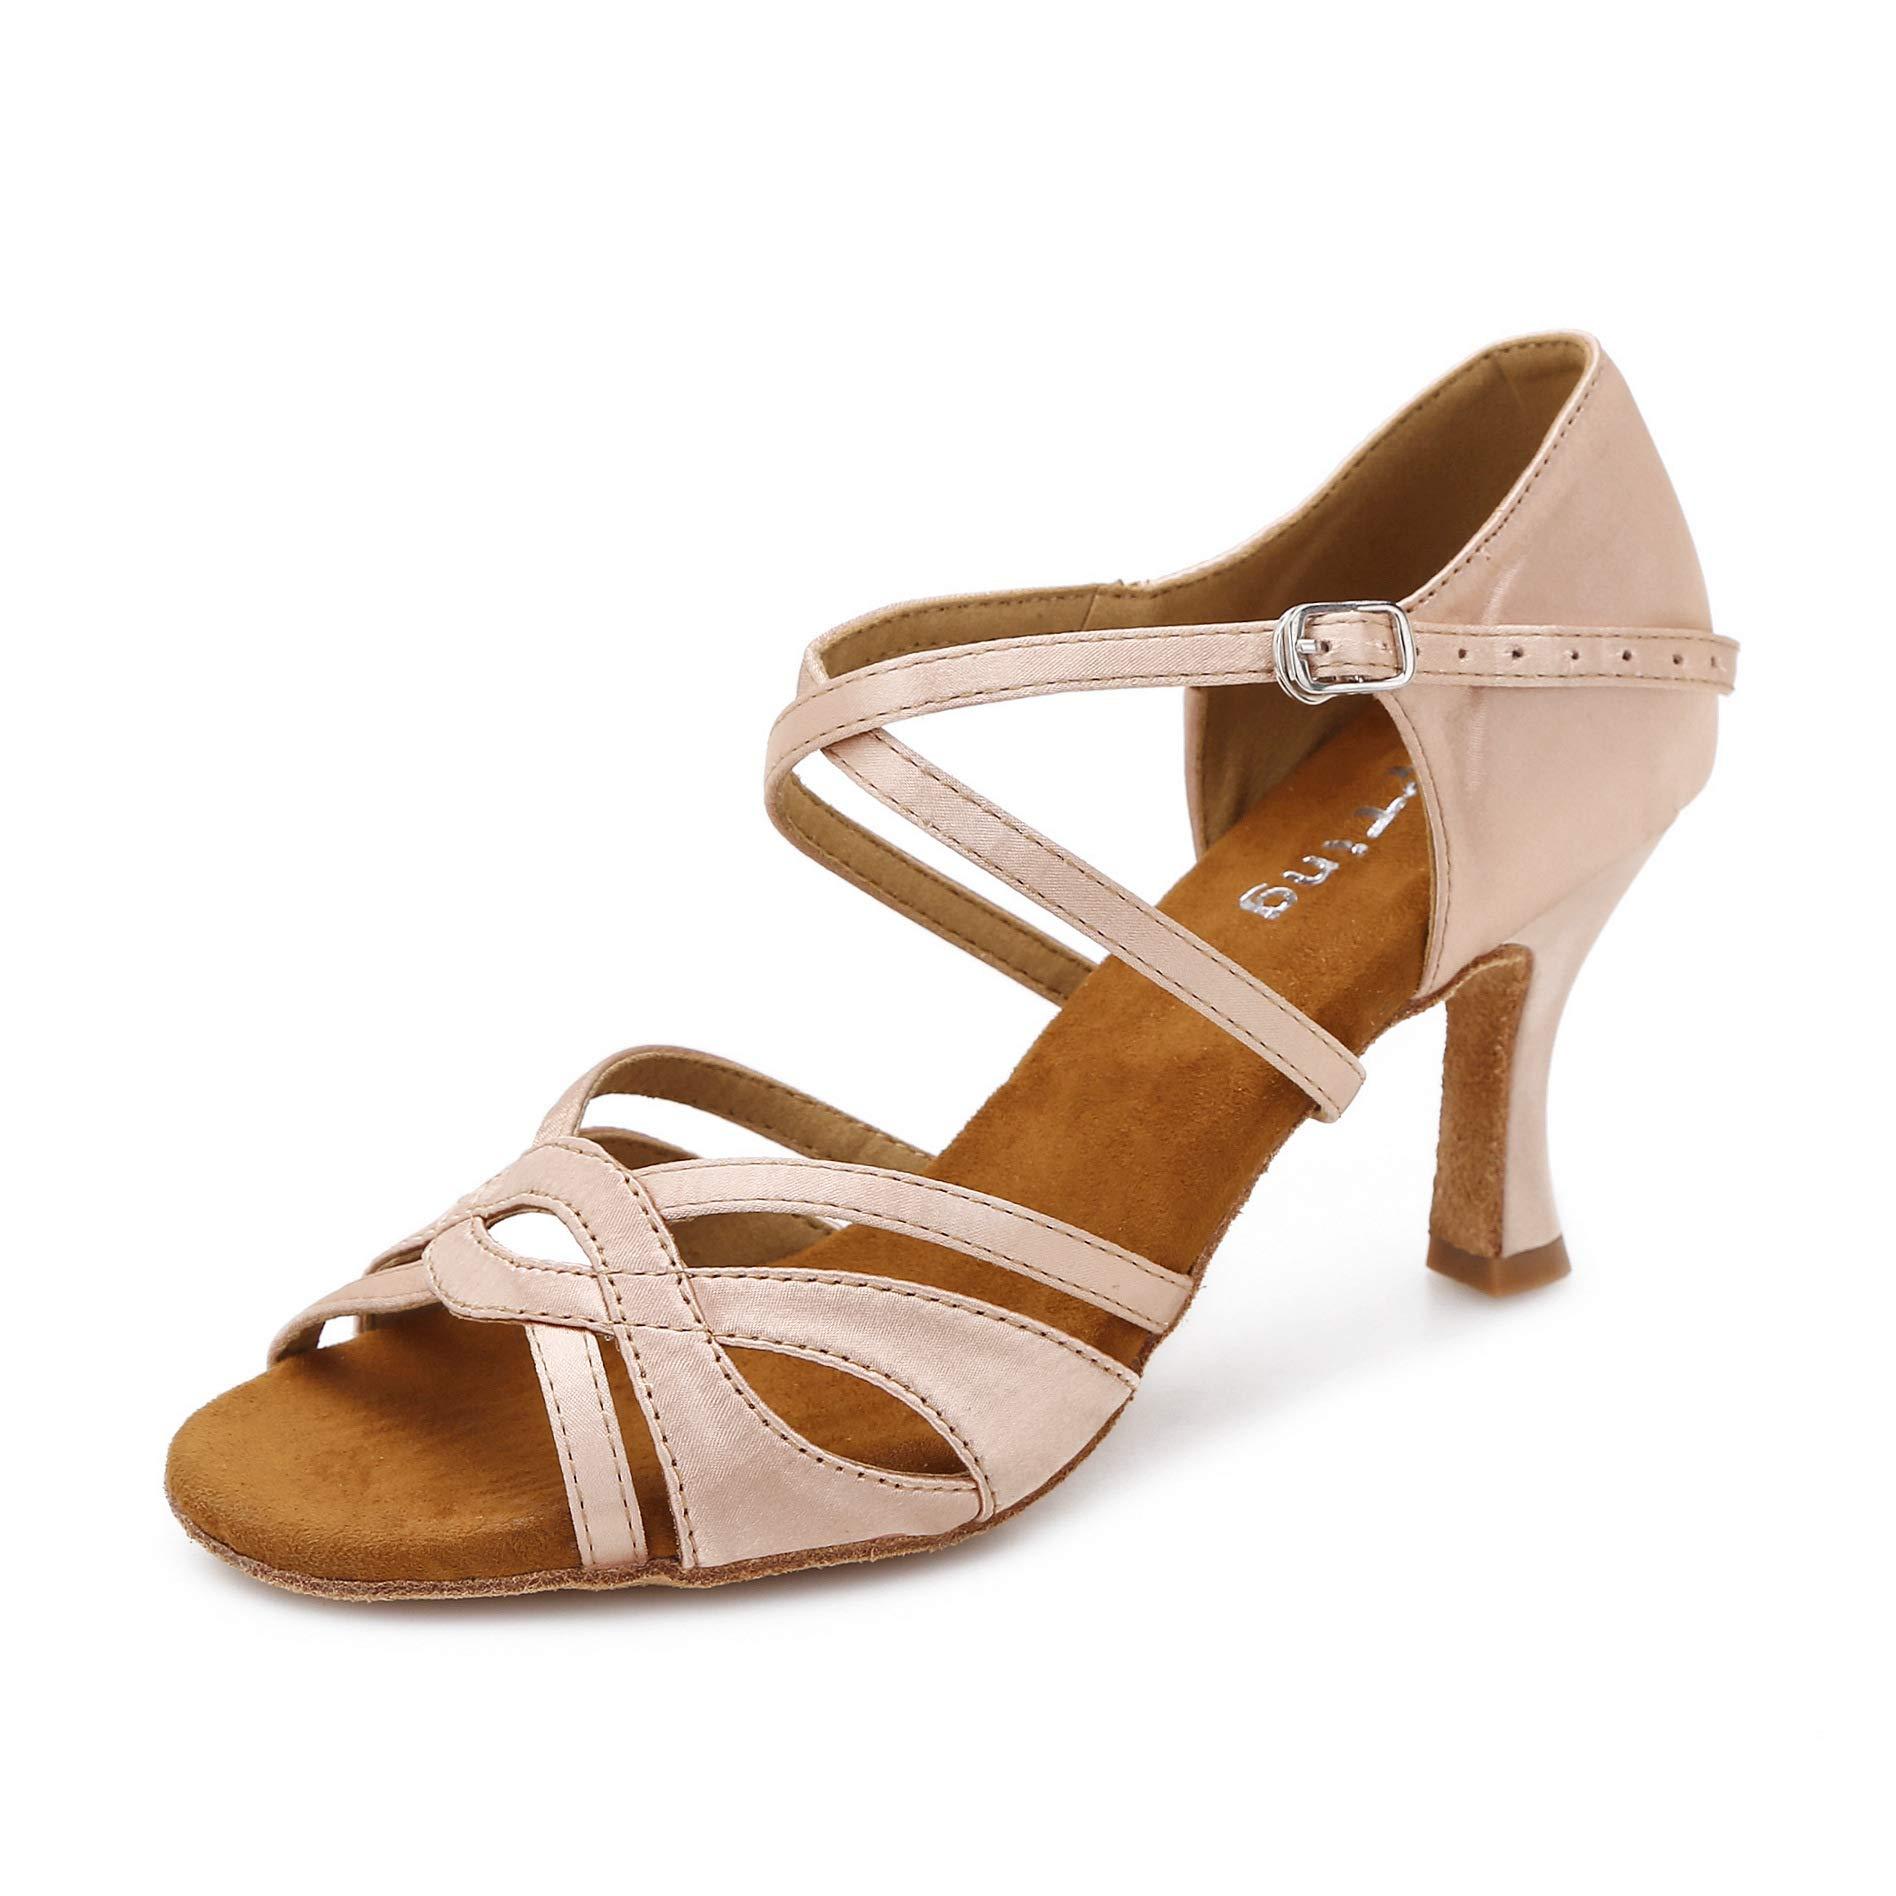 YYTing Women Ballroom Dance Shoes Latin Salsa Bachata Performance Dancing Shoes 3inch(10, Nude) by YYTing